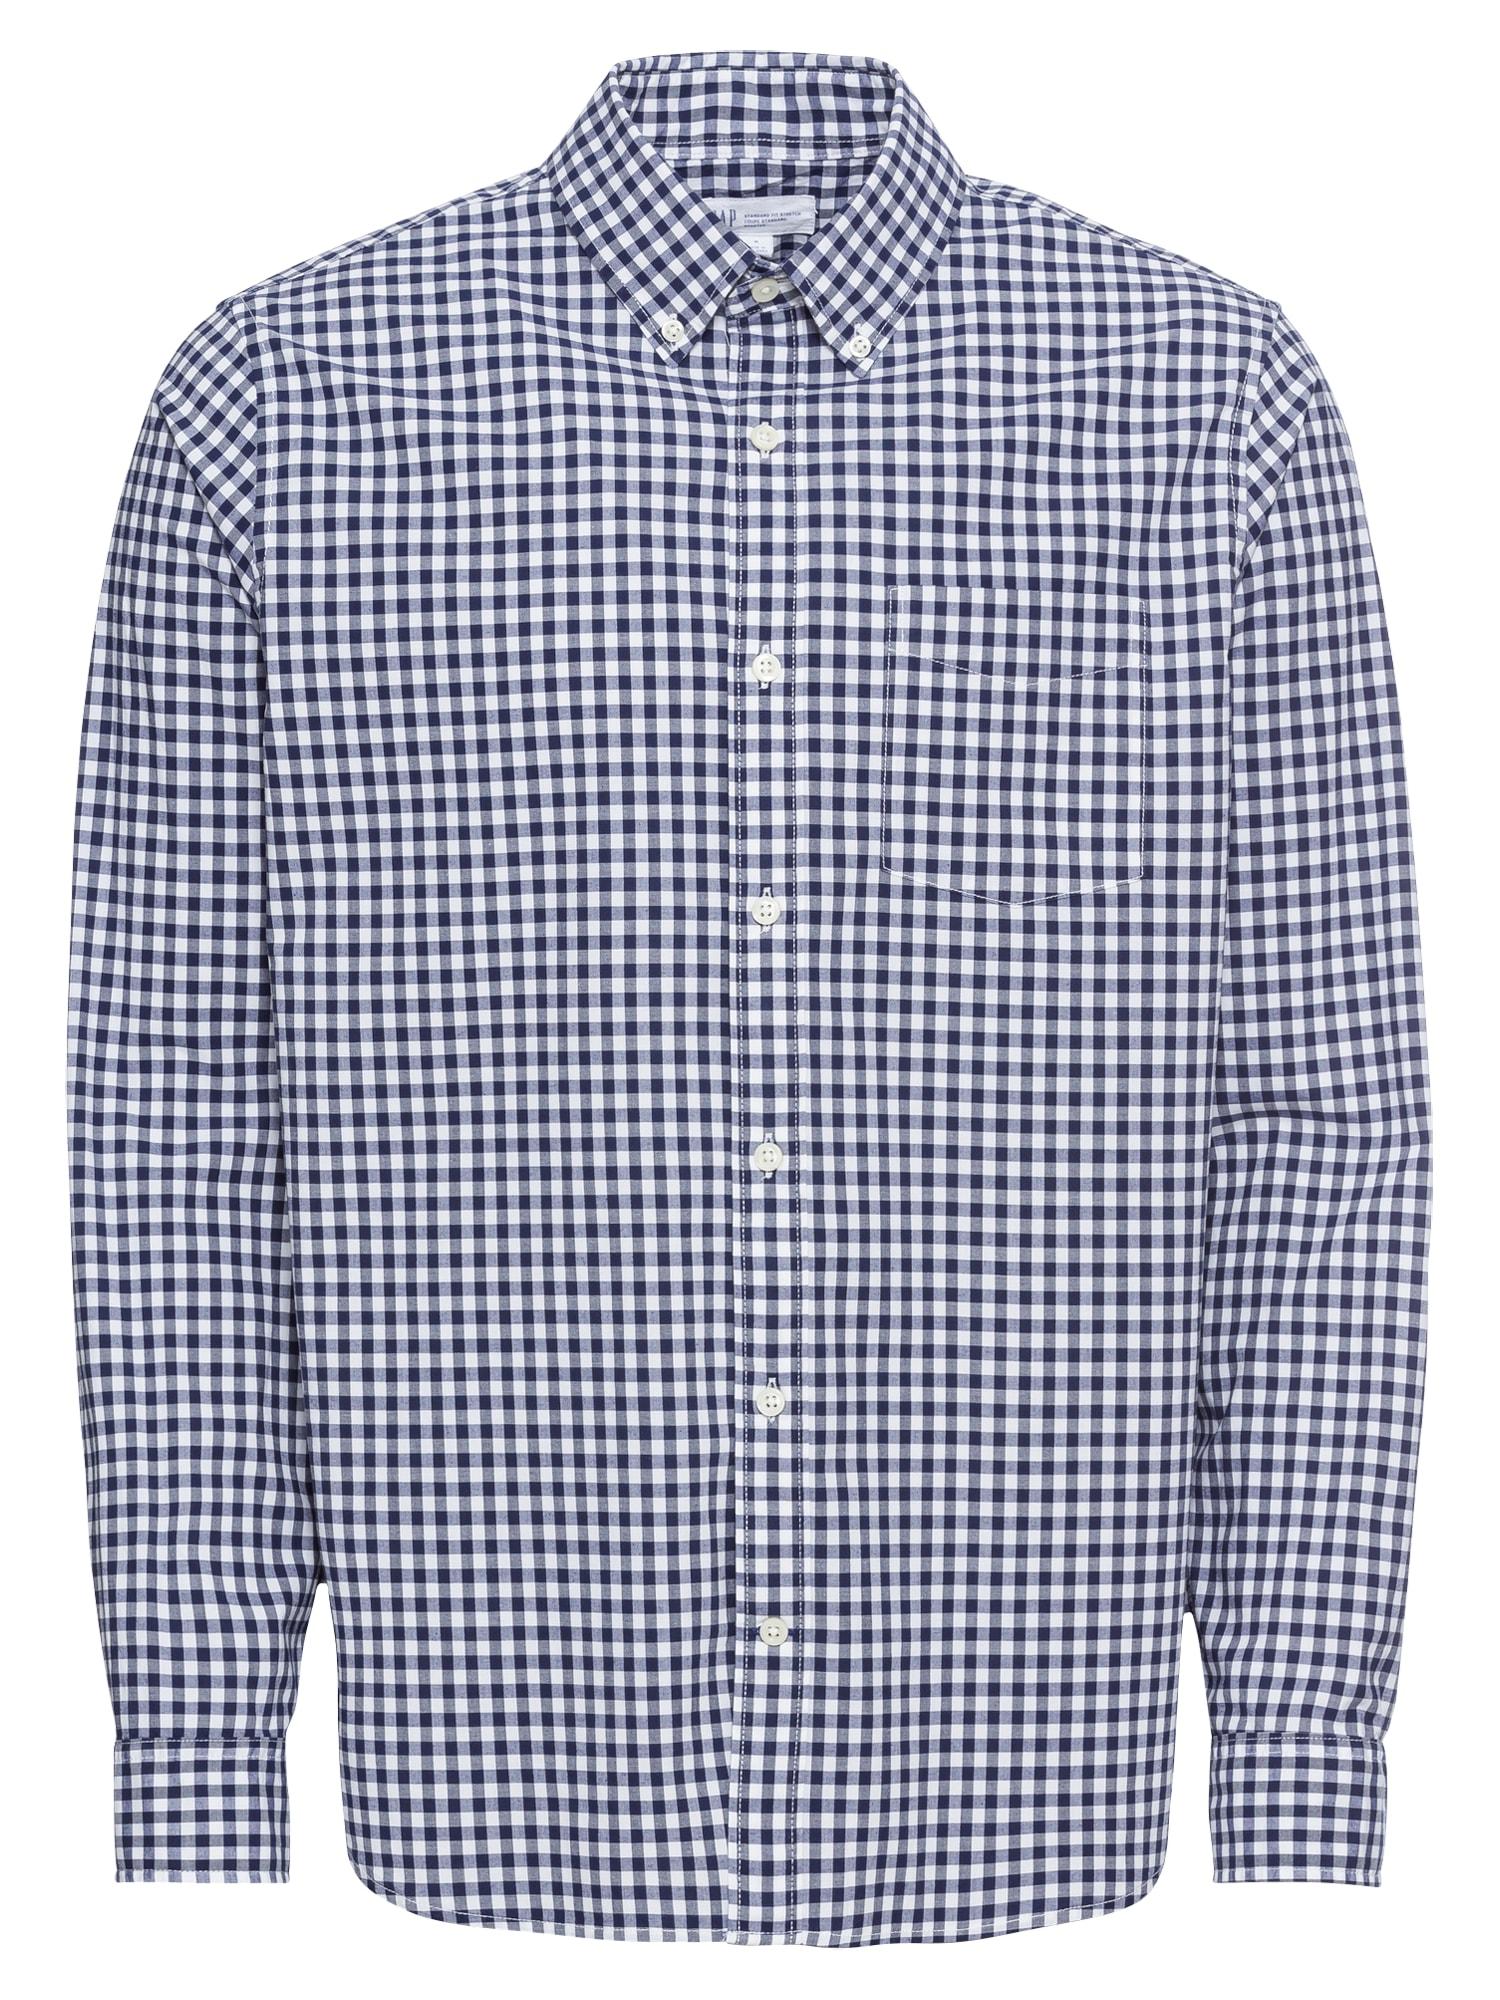 Košile POPLIN ESSENTIALS tmavě modrá bílá GAP